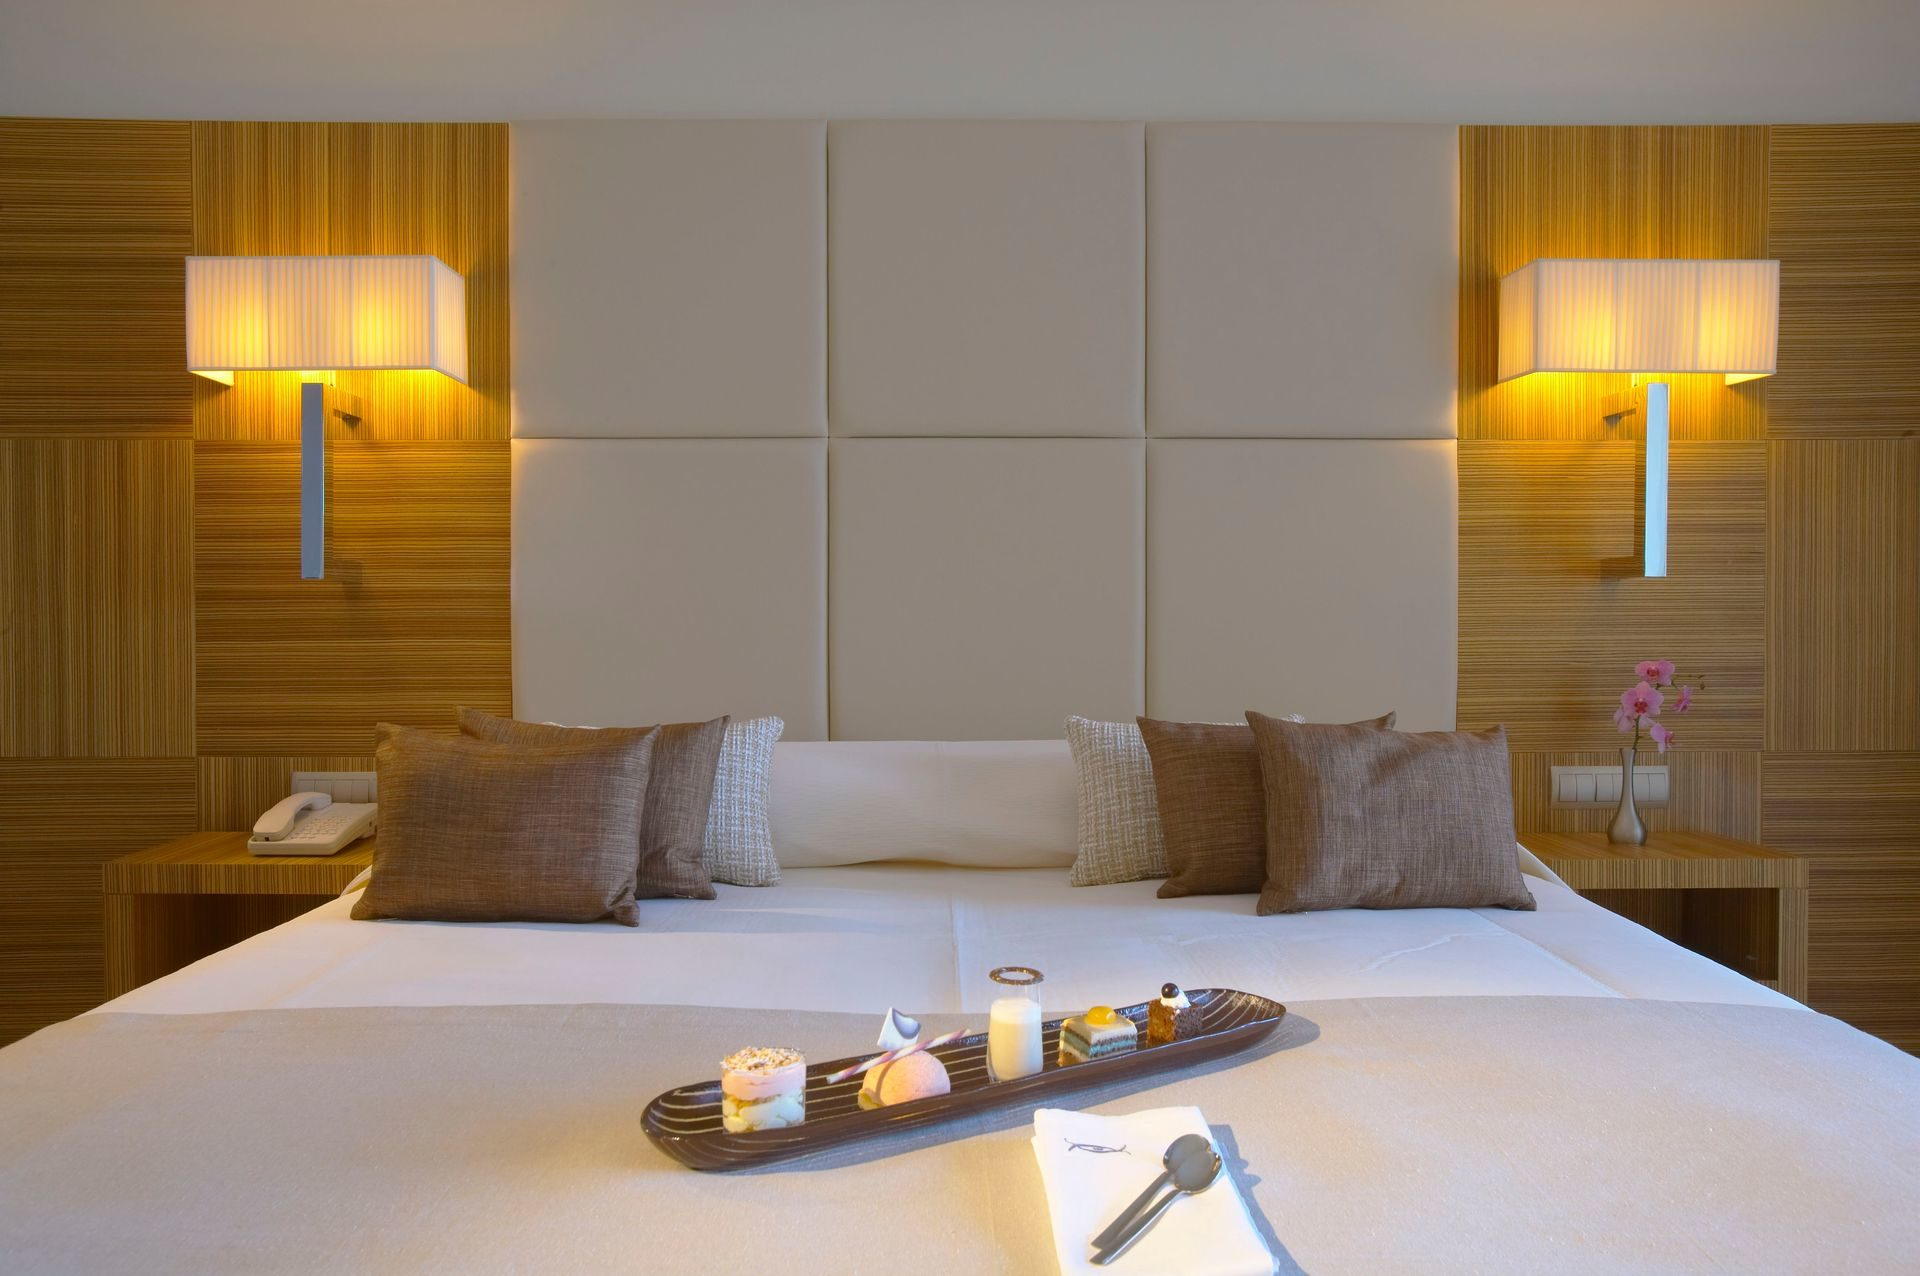 103_Deluxe_Guestroom_Sea_View _(Zebrano)_ELYSIUM_result